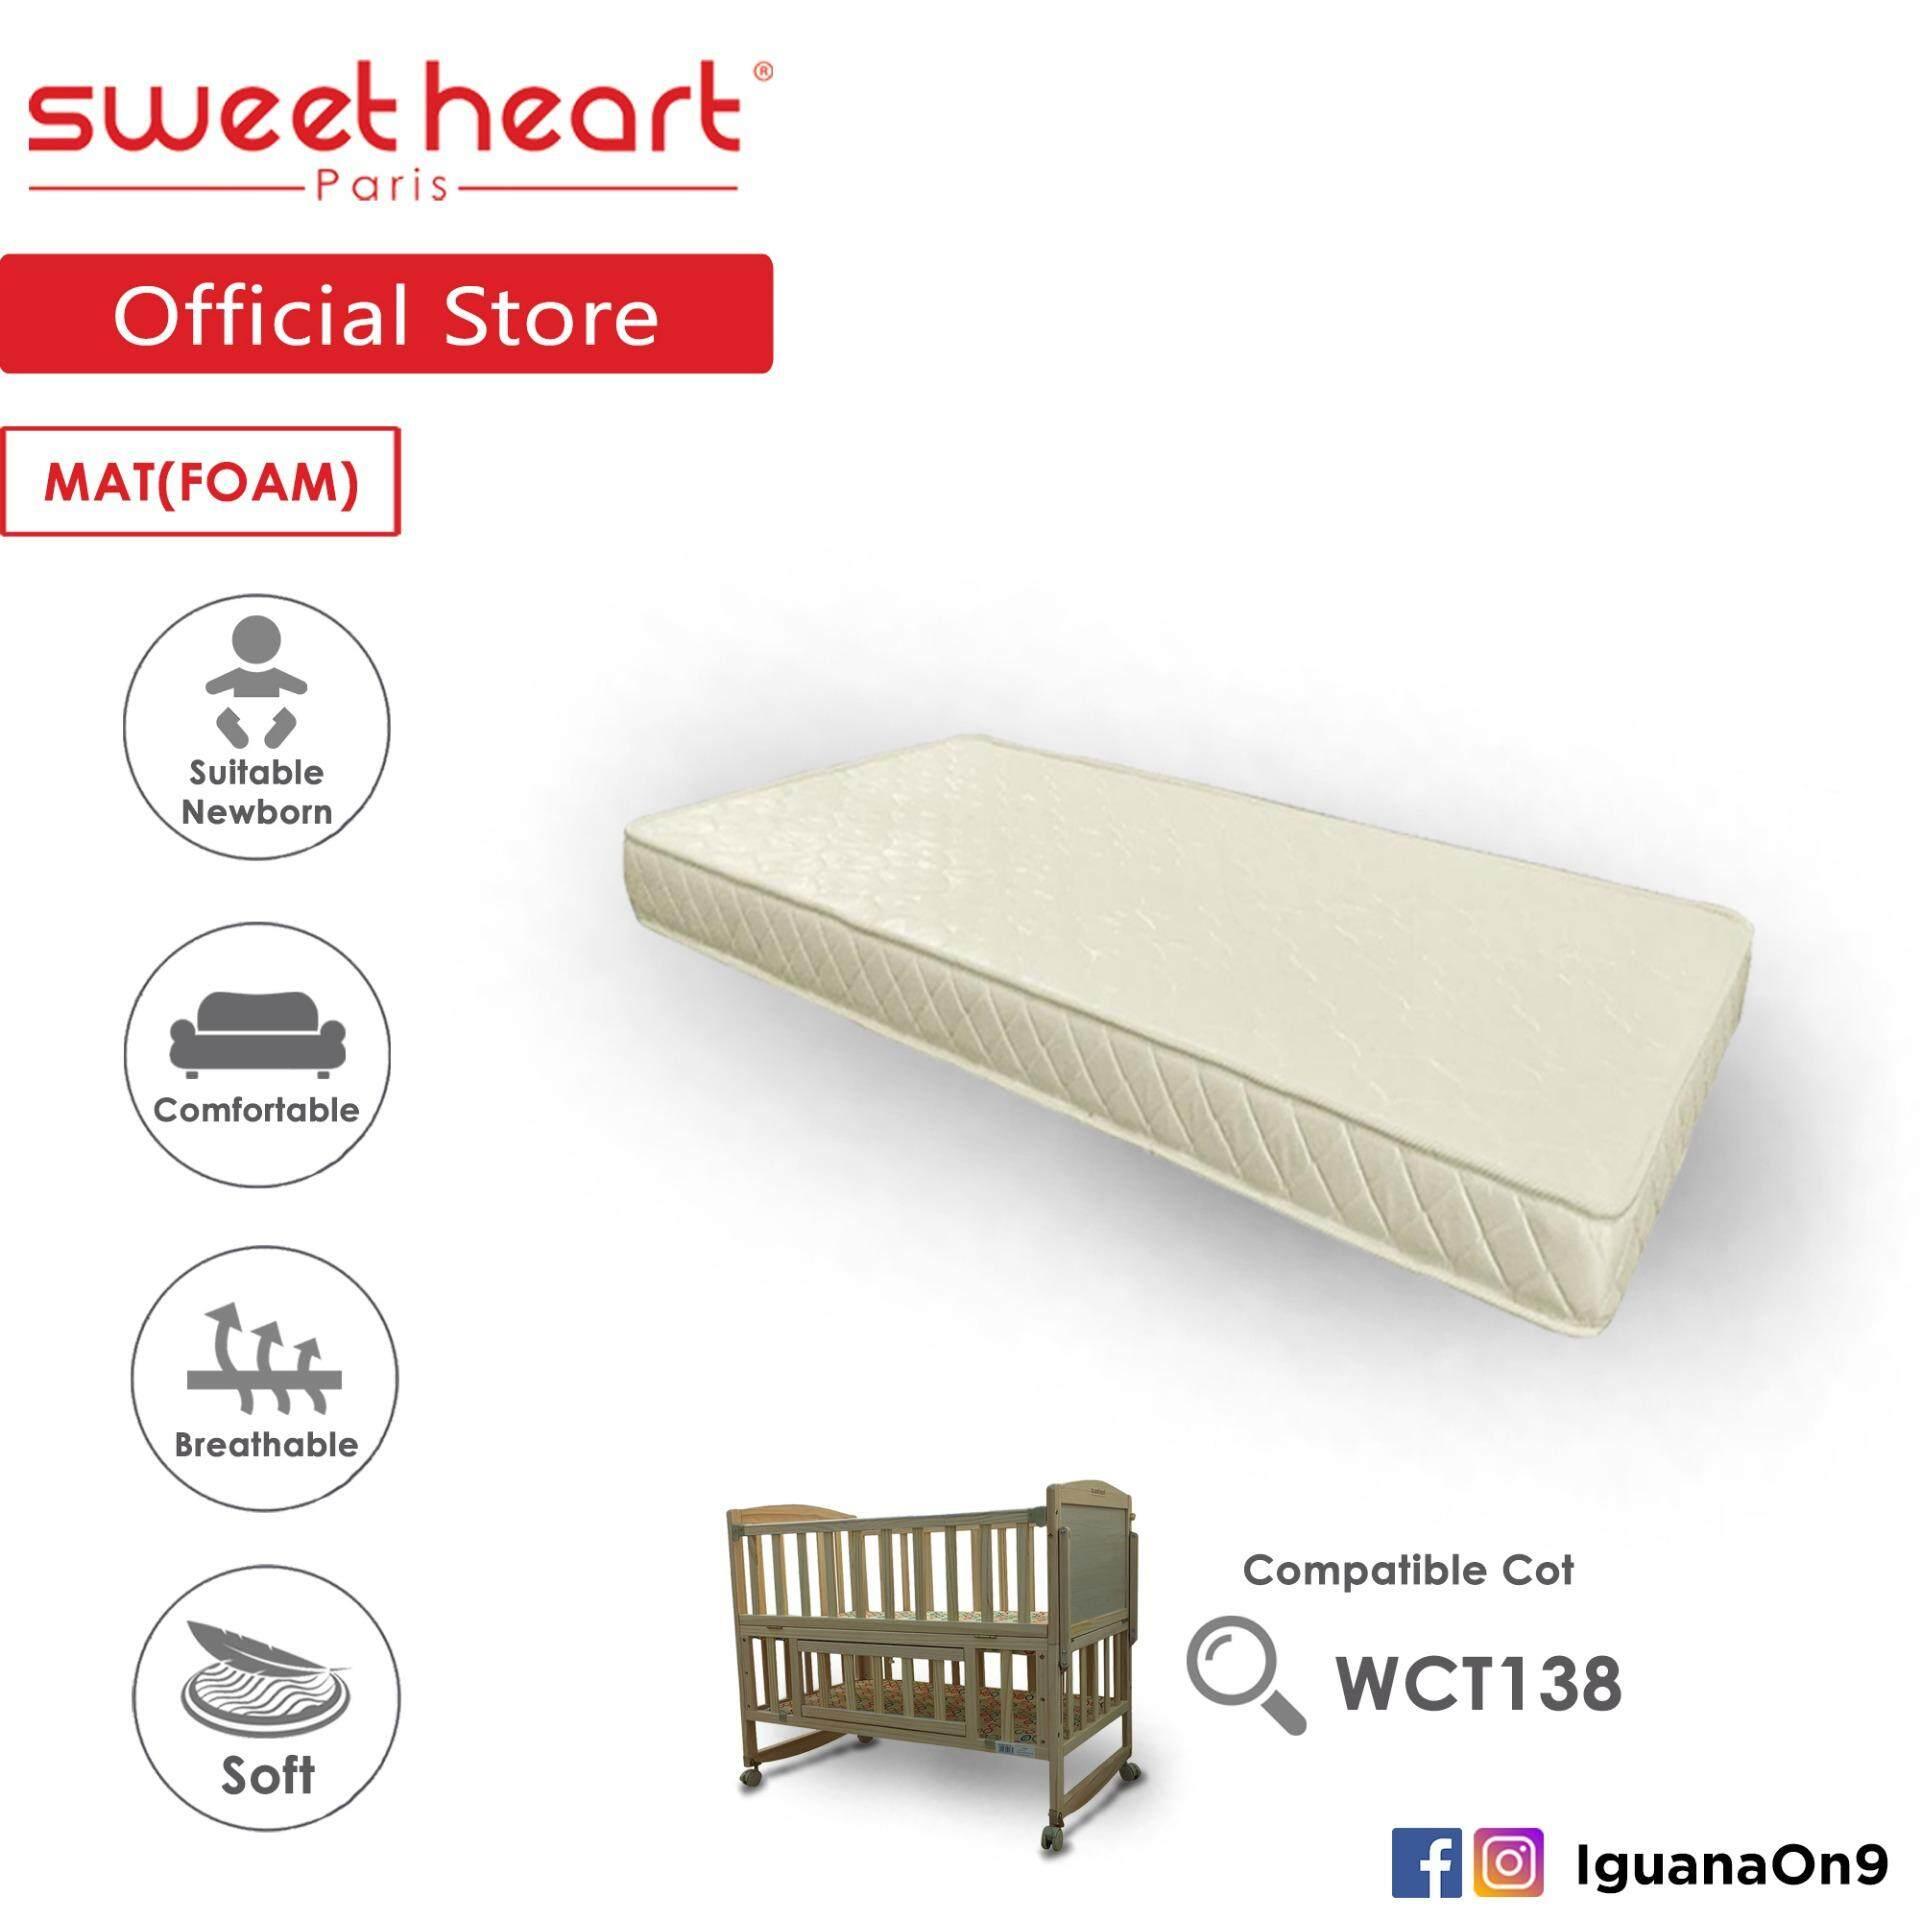 Sweet Heart Paris 5˝ Thickness Foam Mattress For SHP Wooden Cot WCT138